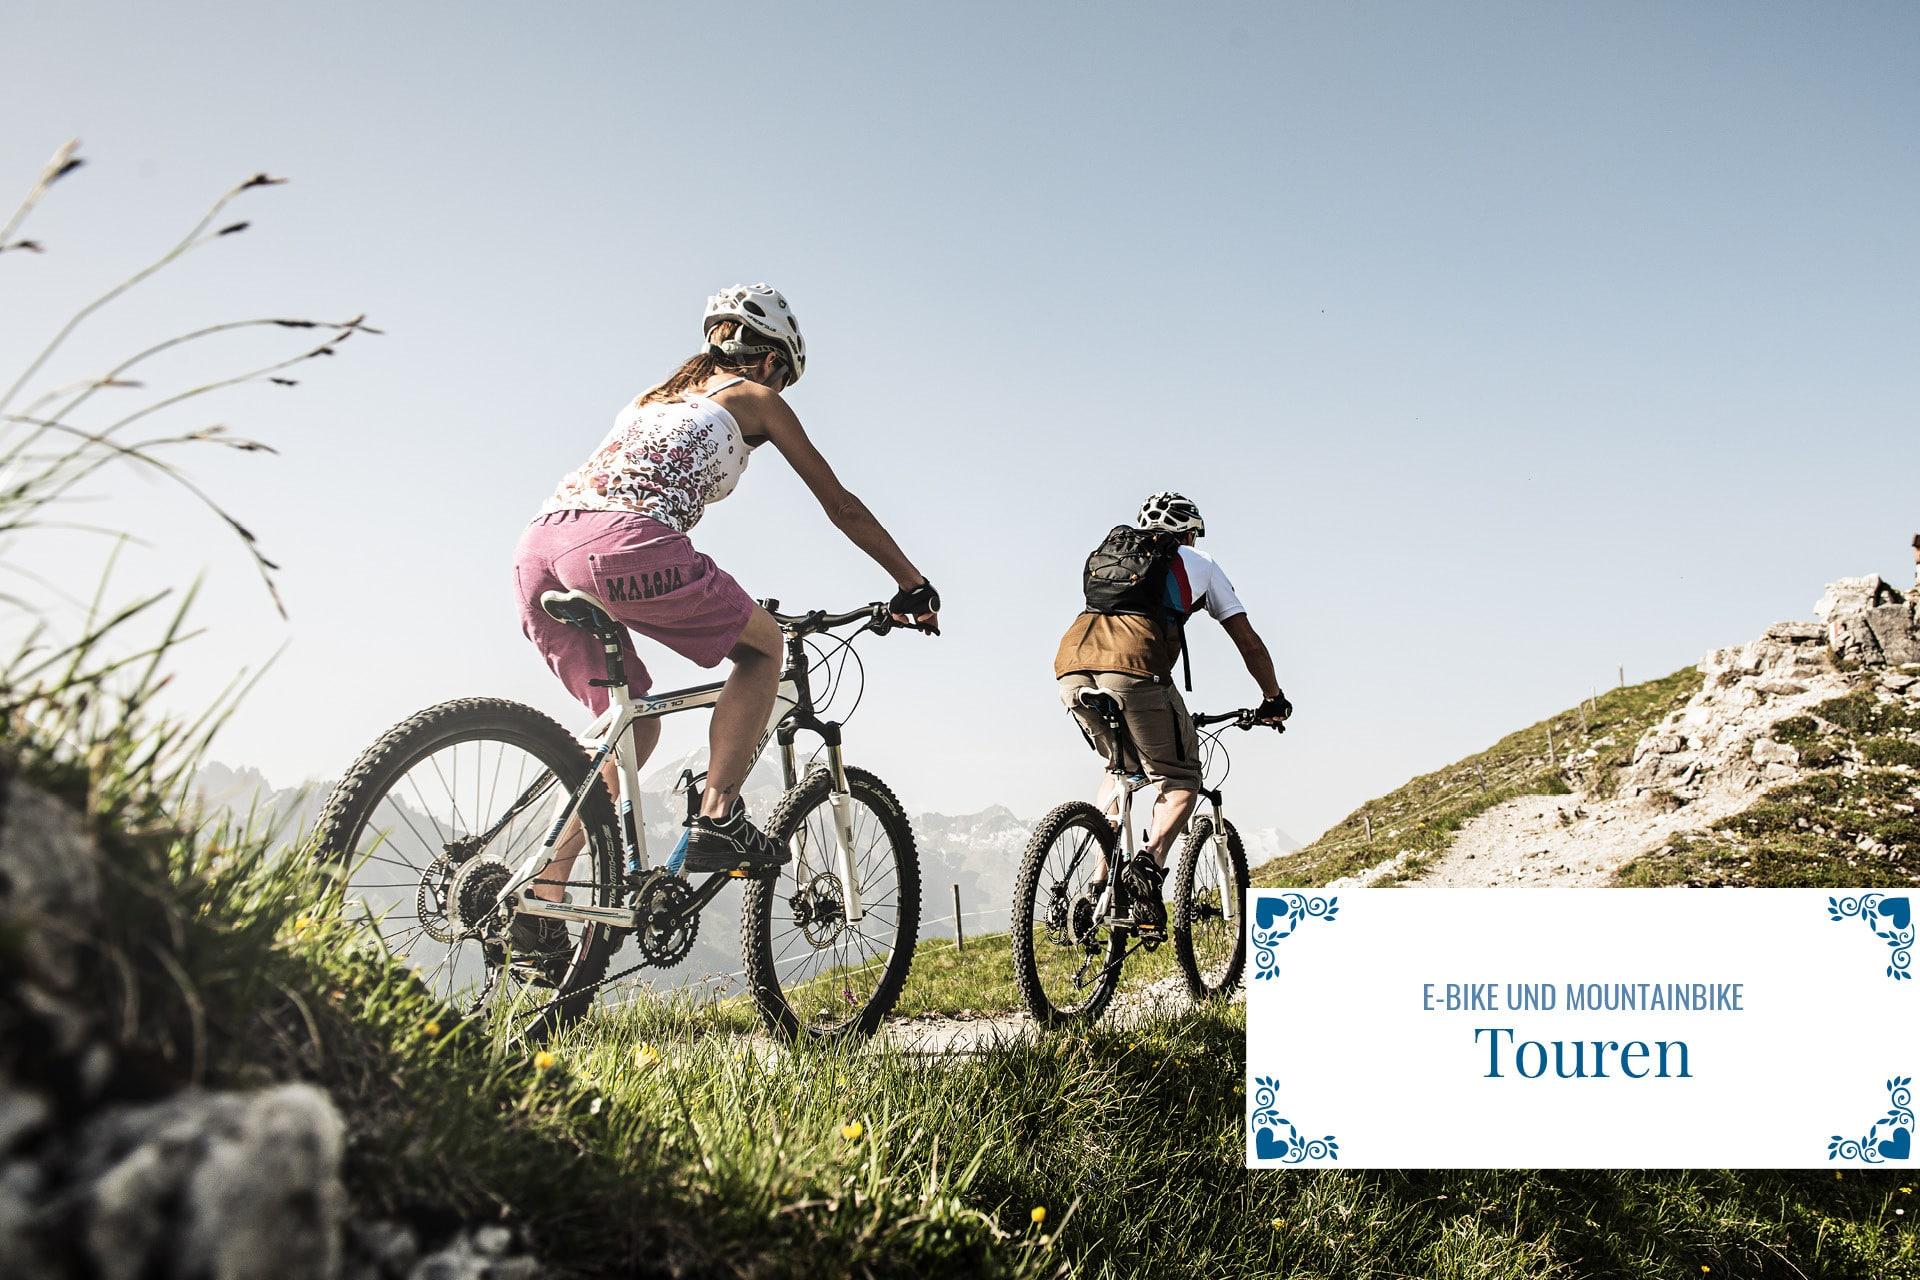 Sepp-und-Hannis-Stubaital-Sommerhighlight-E-Bike-Mountainbike-Aktivurlaub-Tirol